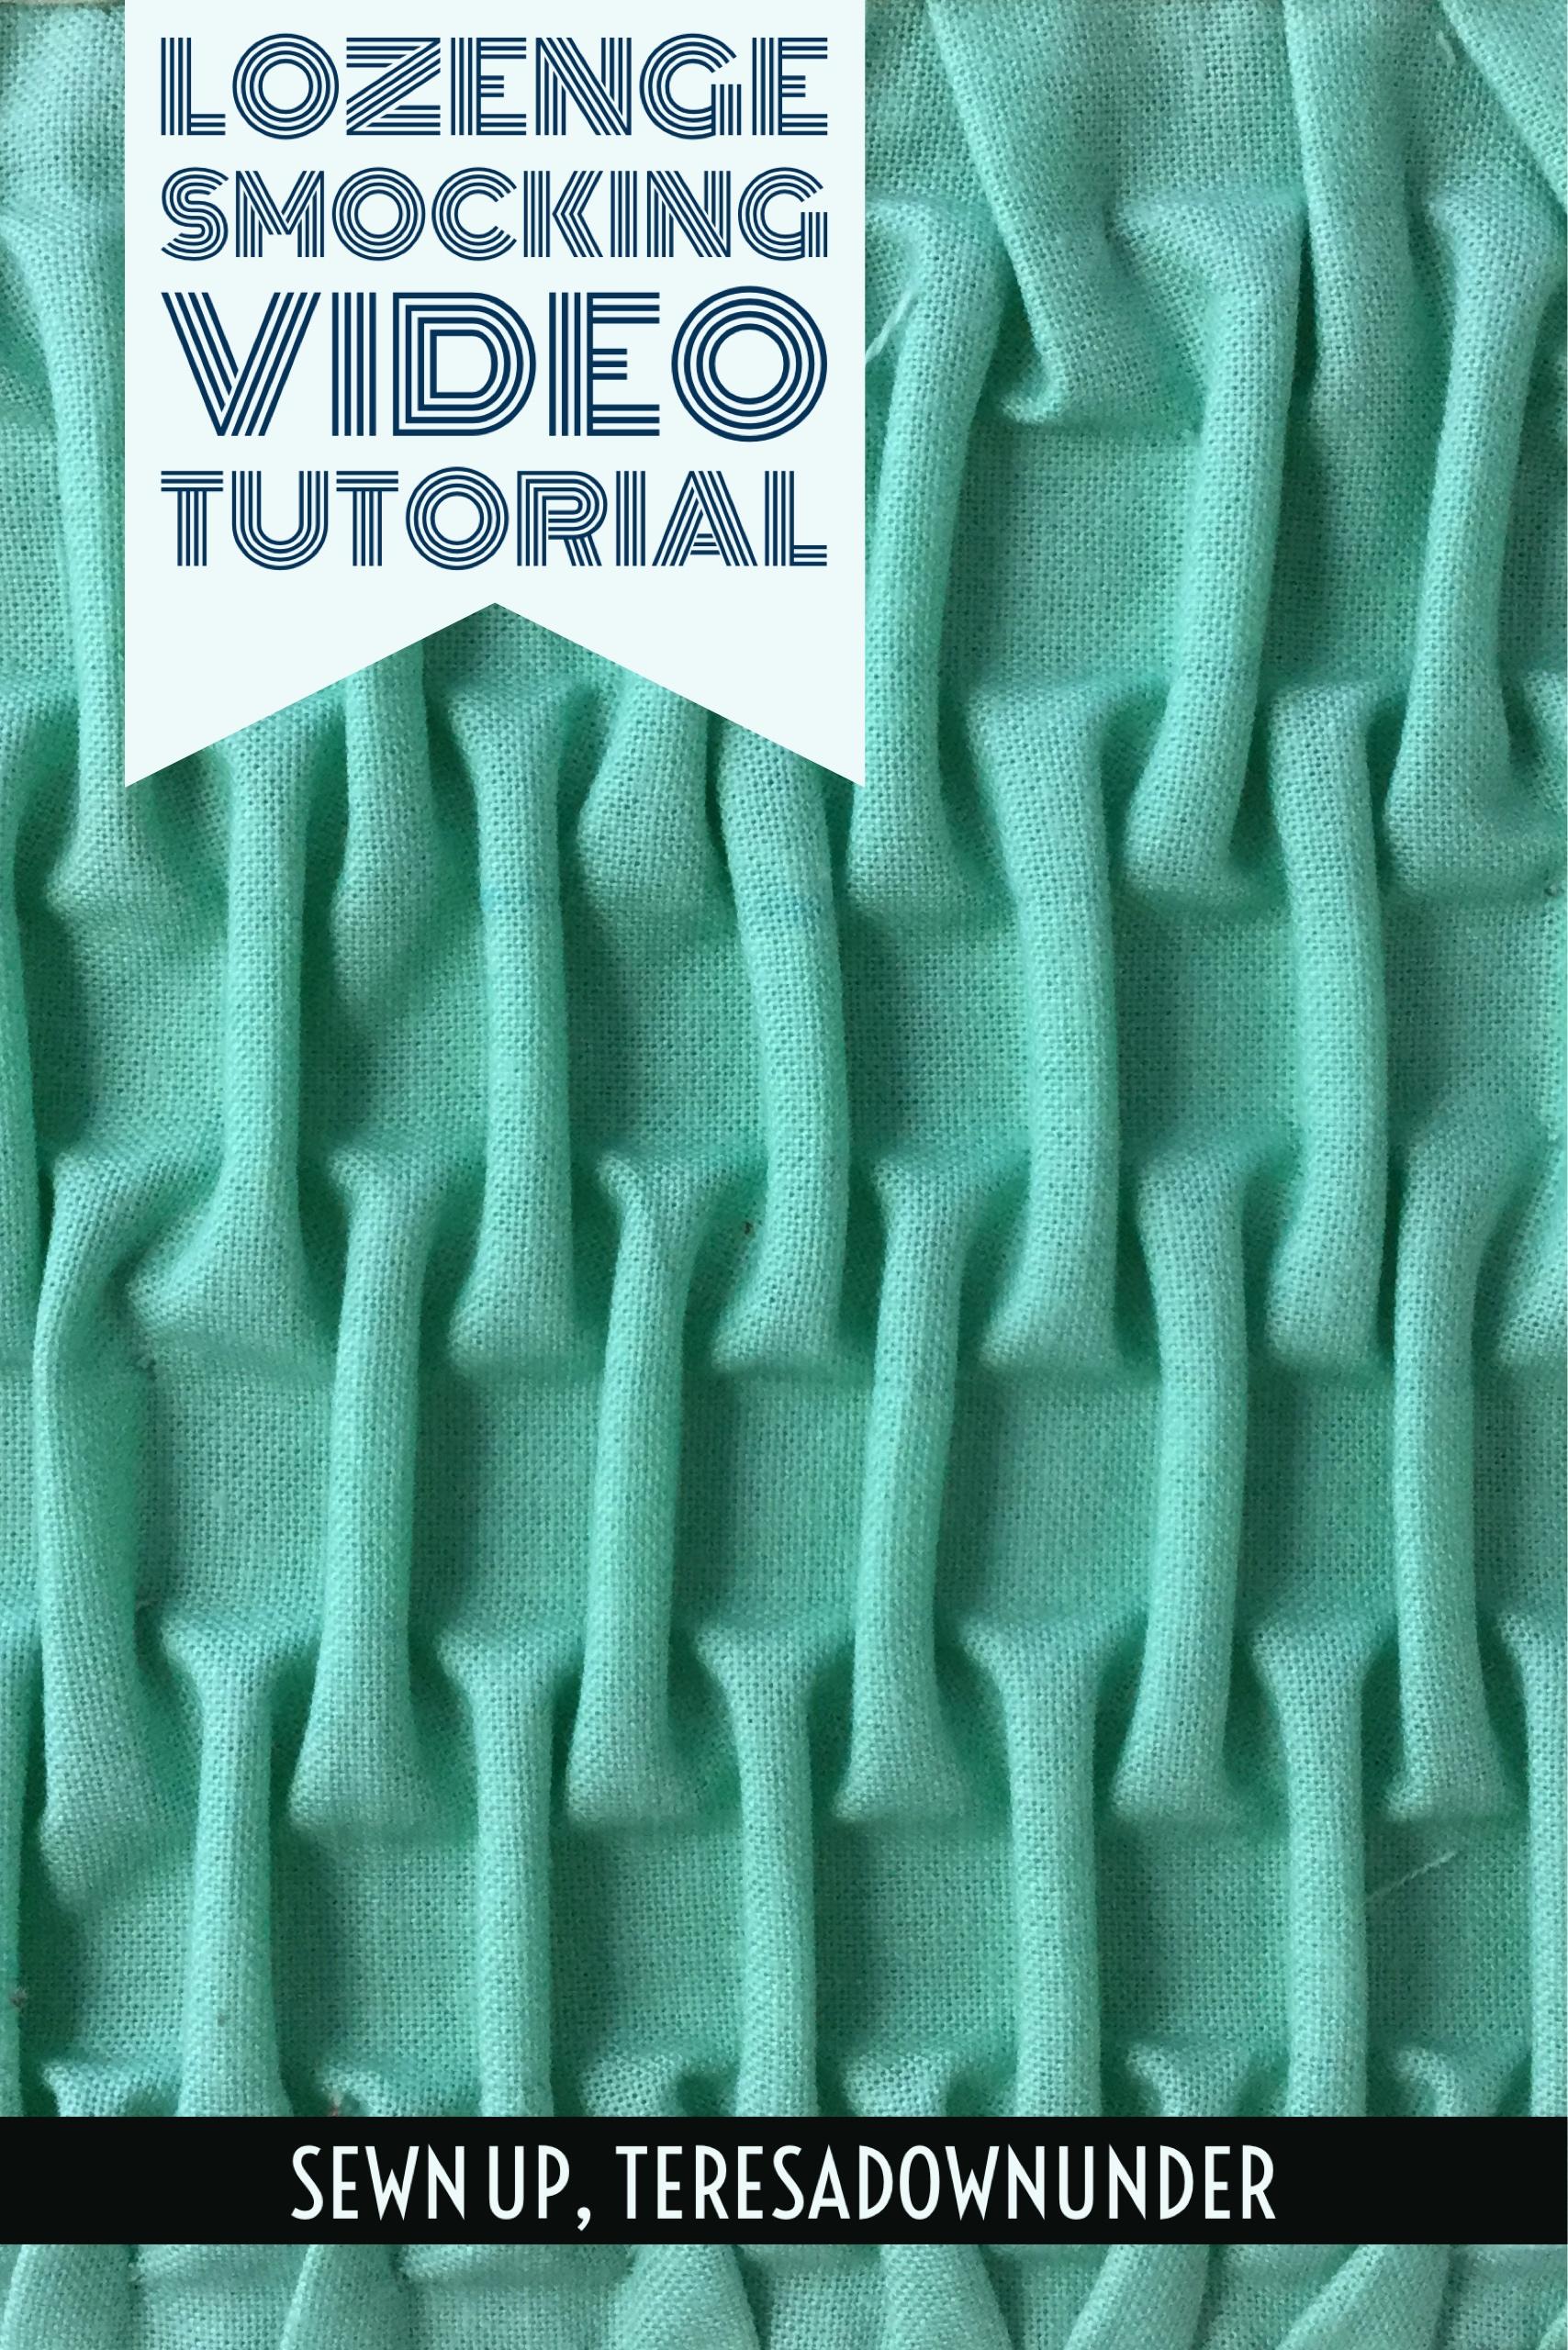 Video tutorial: Lozenge smocking | Sewn Up